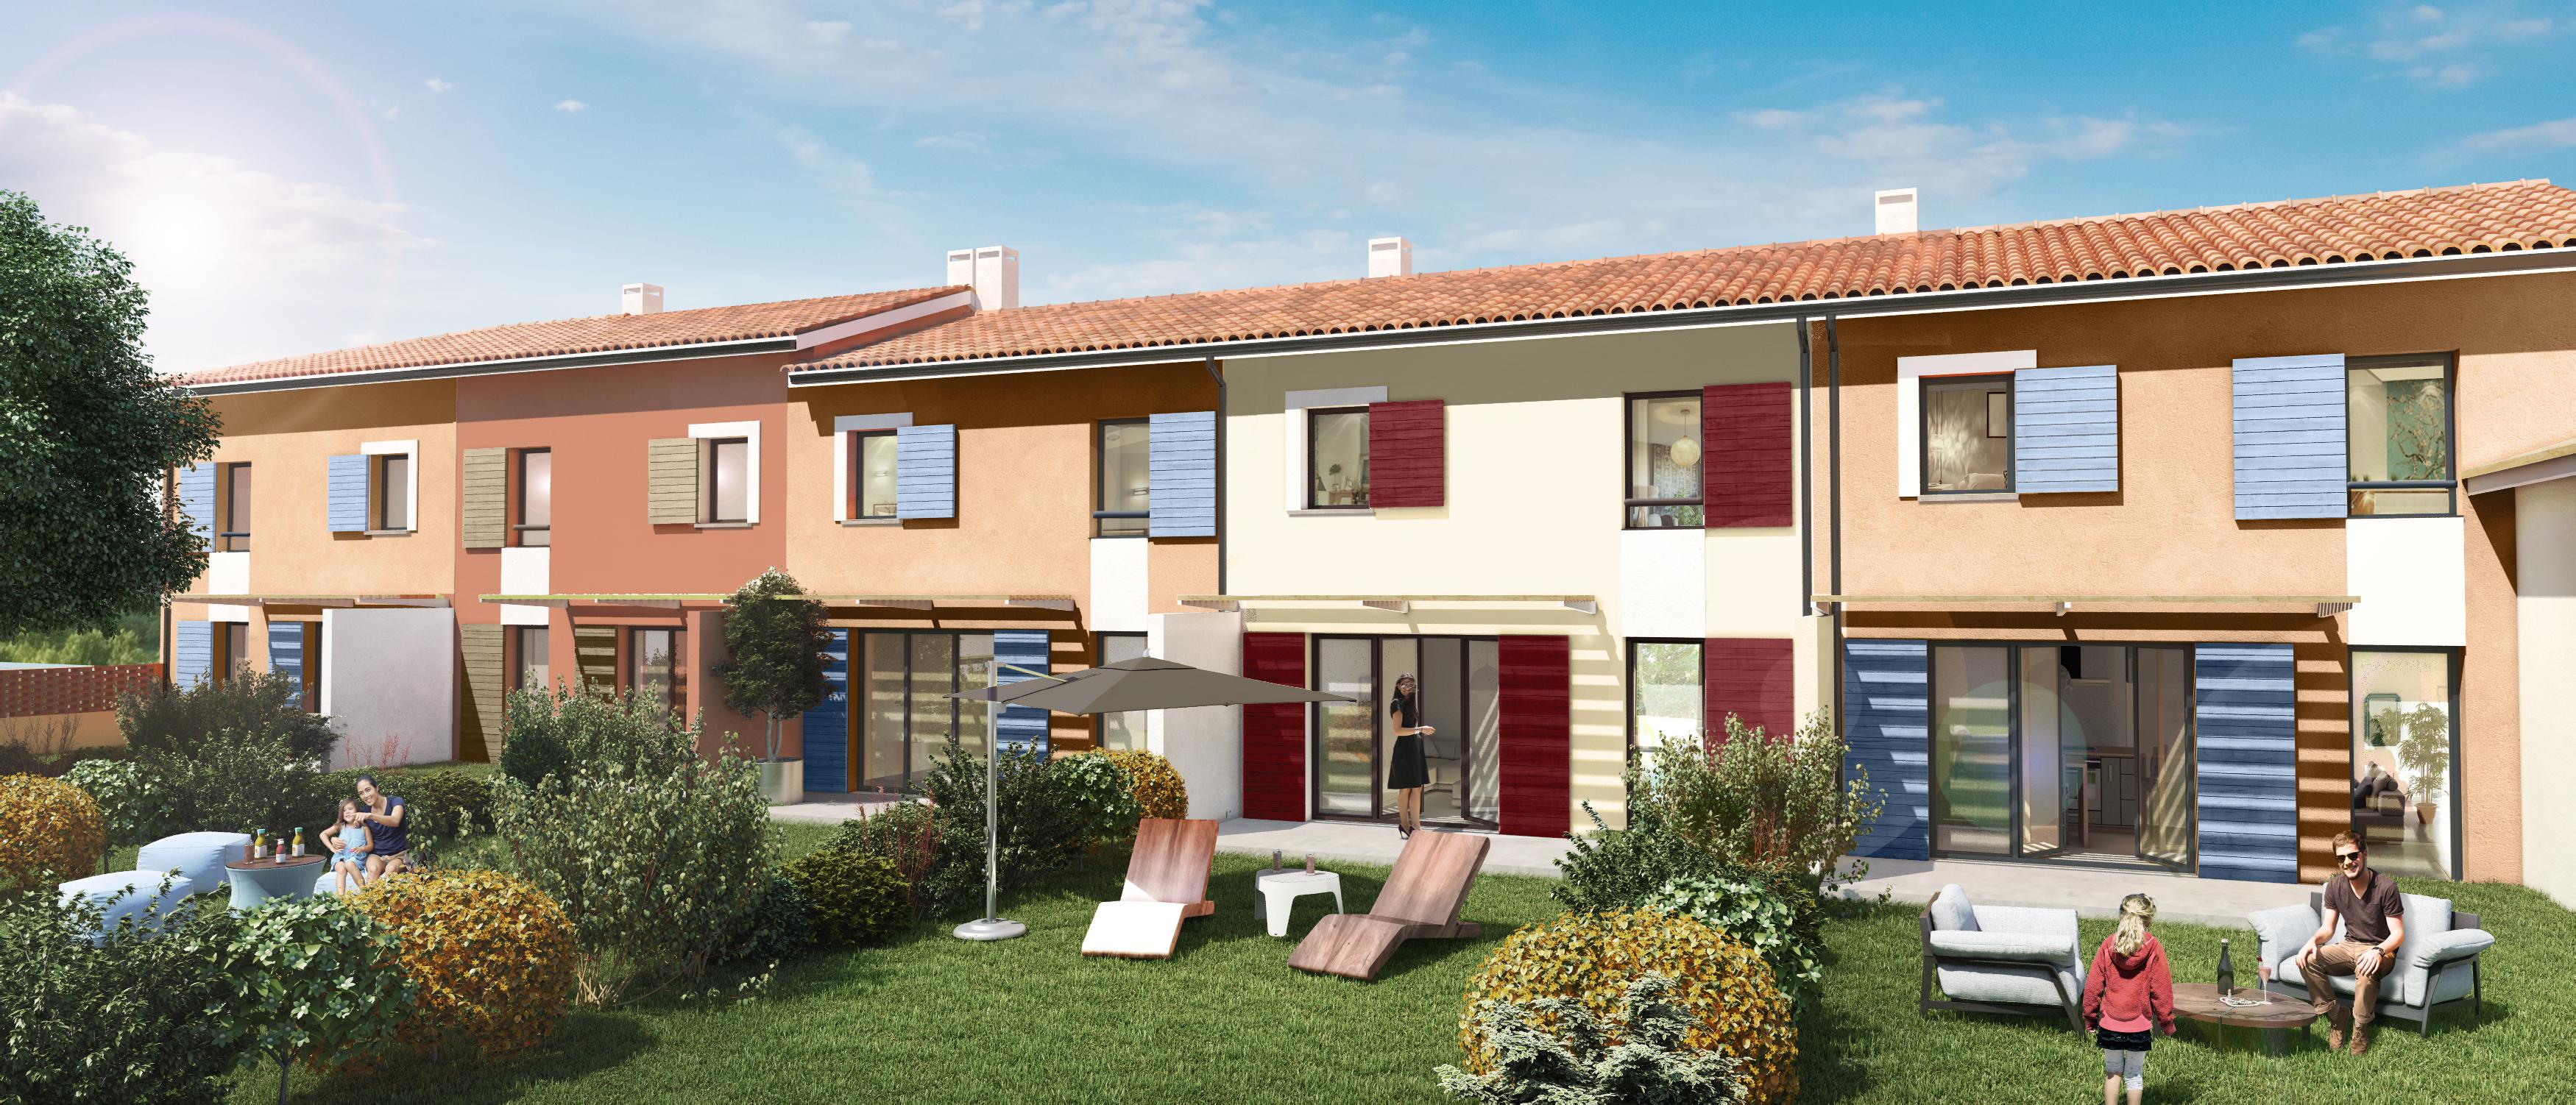 Programme neuf maisons neuves loi pechbonnieu 31140 for Programme maisons neuves